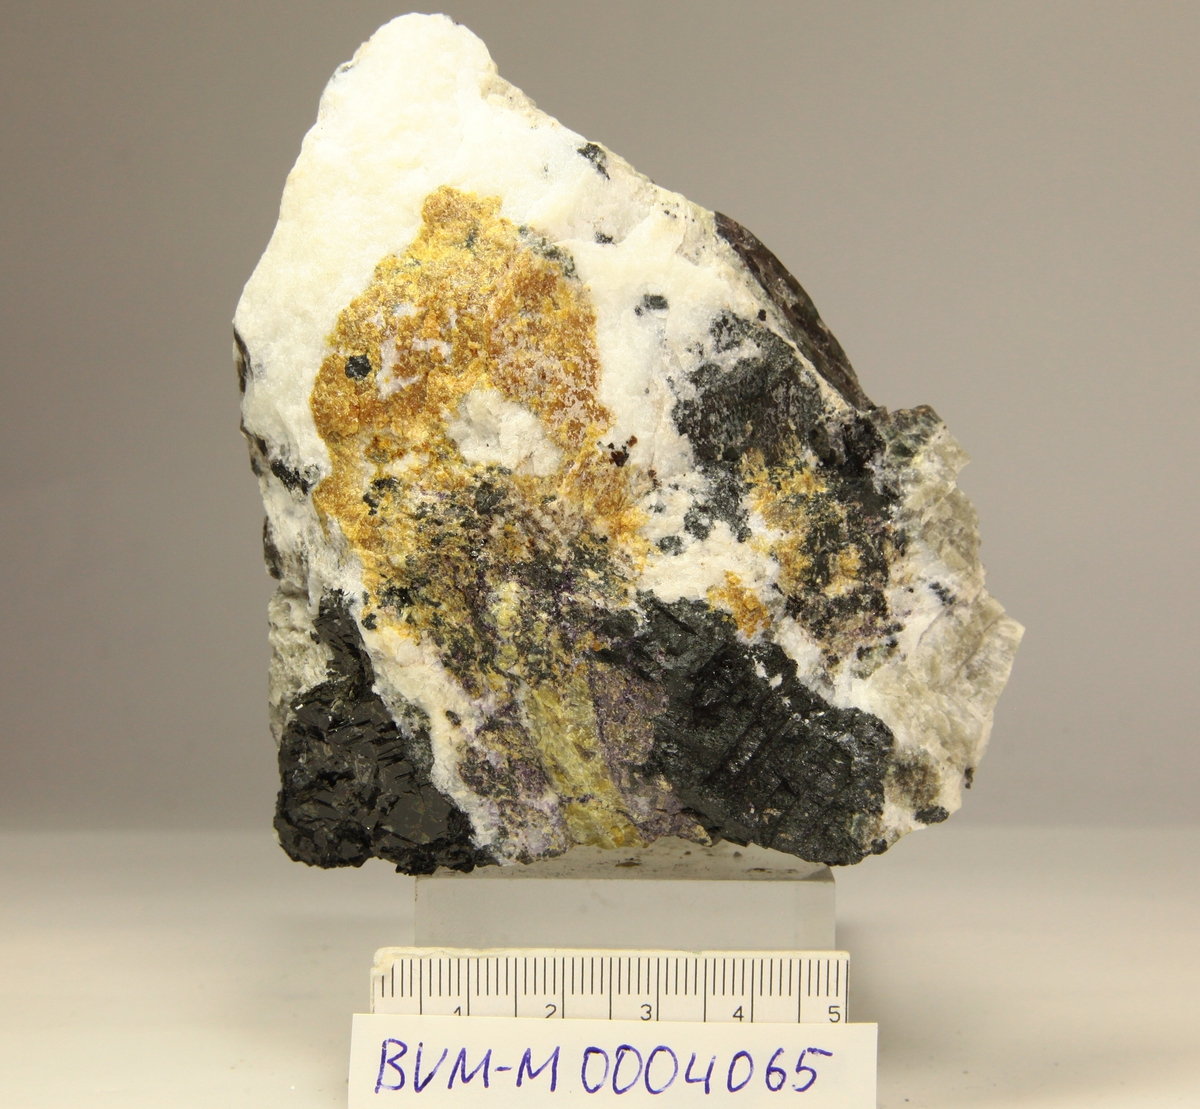 Zirsilitt-(Ce), orangebrunt aggregat. Feltspat, biotitt, nefelin, flusspat, cancrinitt(?). Sagåsen gruve, Mørje.